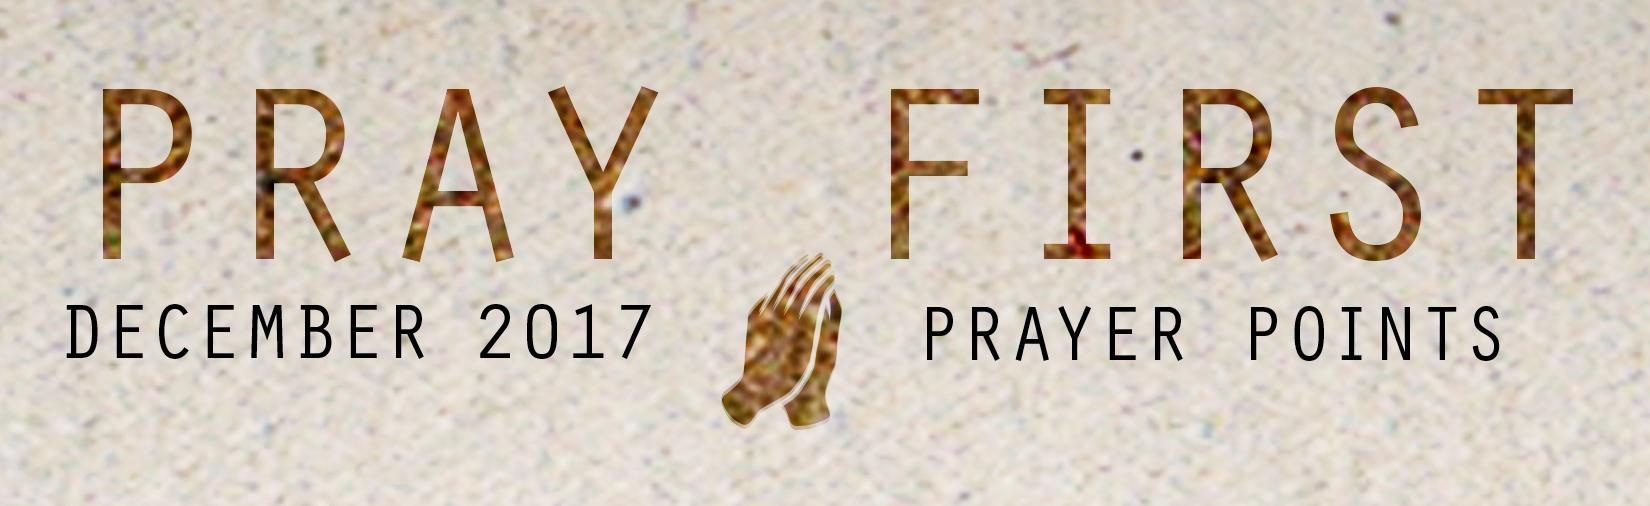 PRAY FIRST DEC 2017 title.jpg